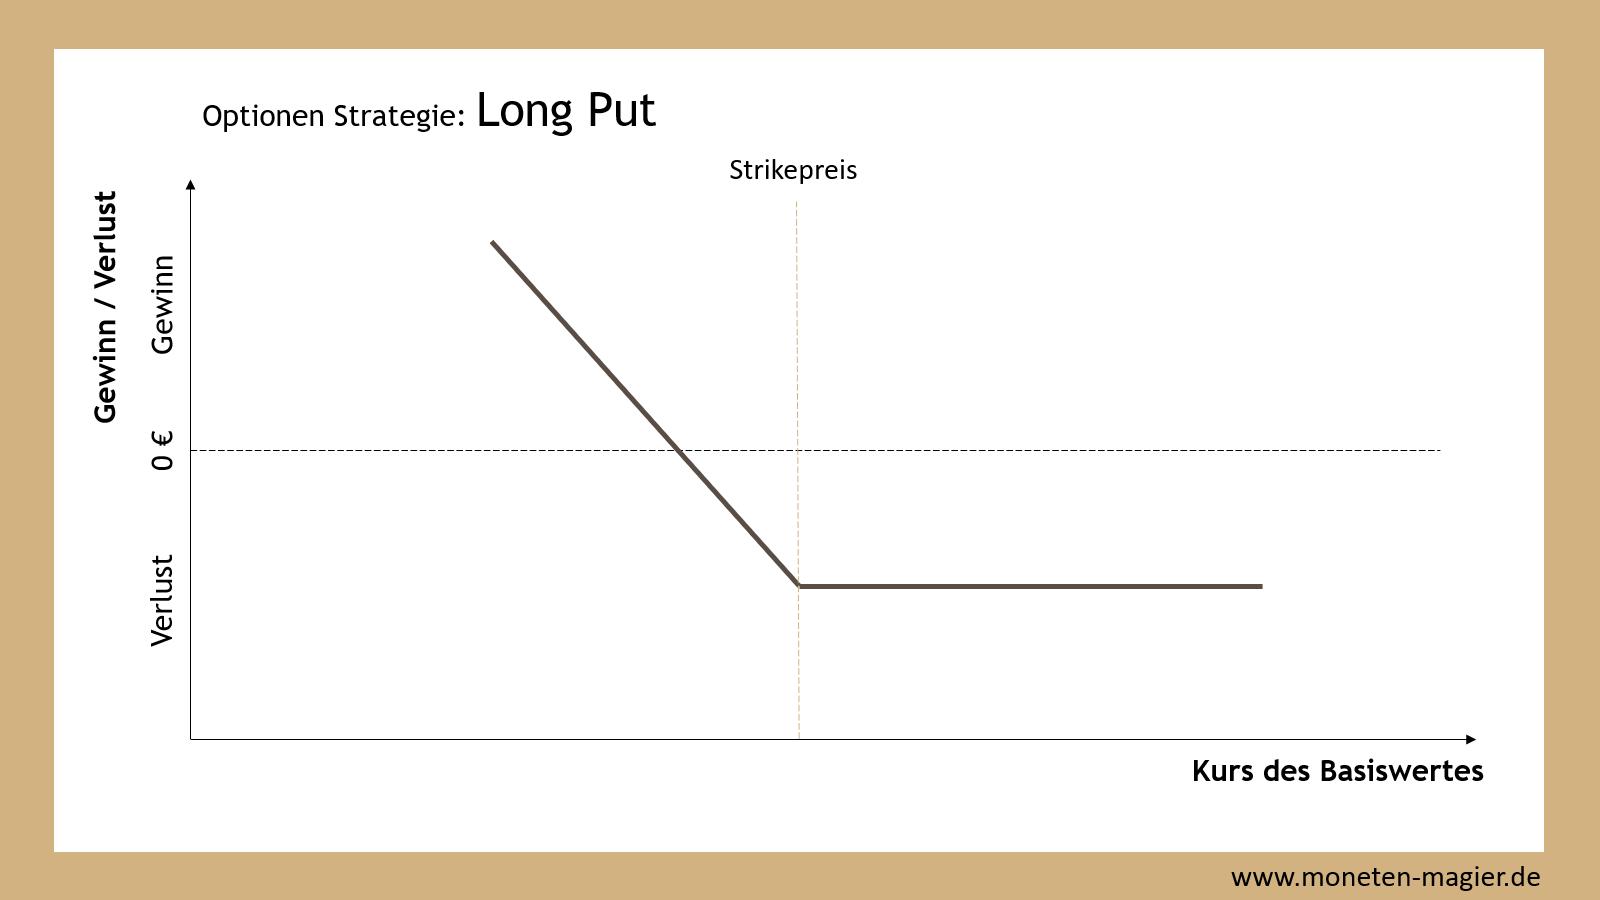 long put optionen strategie moneten magier